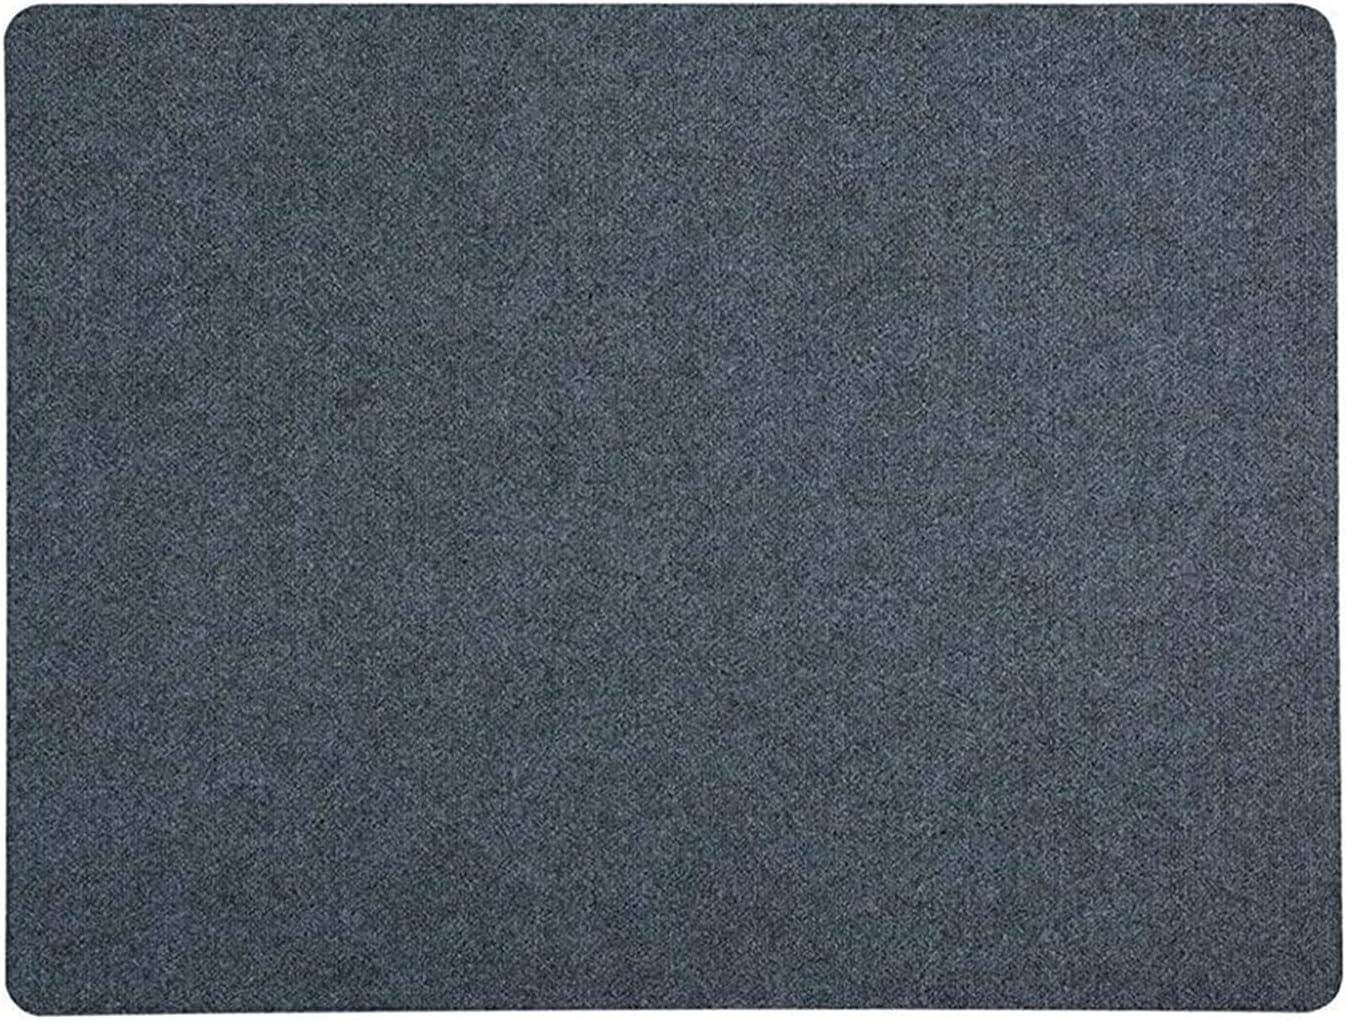 KAIFENGJUBIAN Floor Protector,Chair Protector,N Mat,Carpet Baltimore Mall NEW before selling